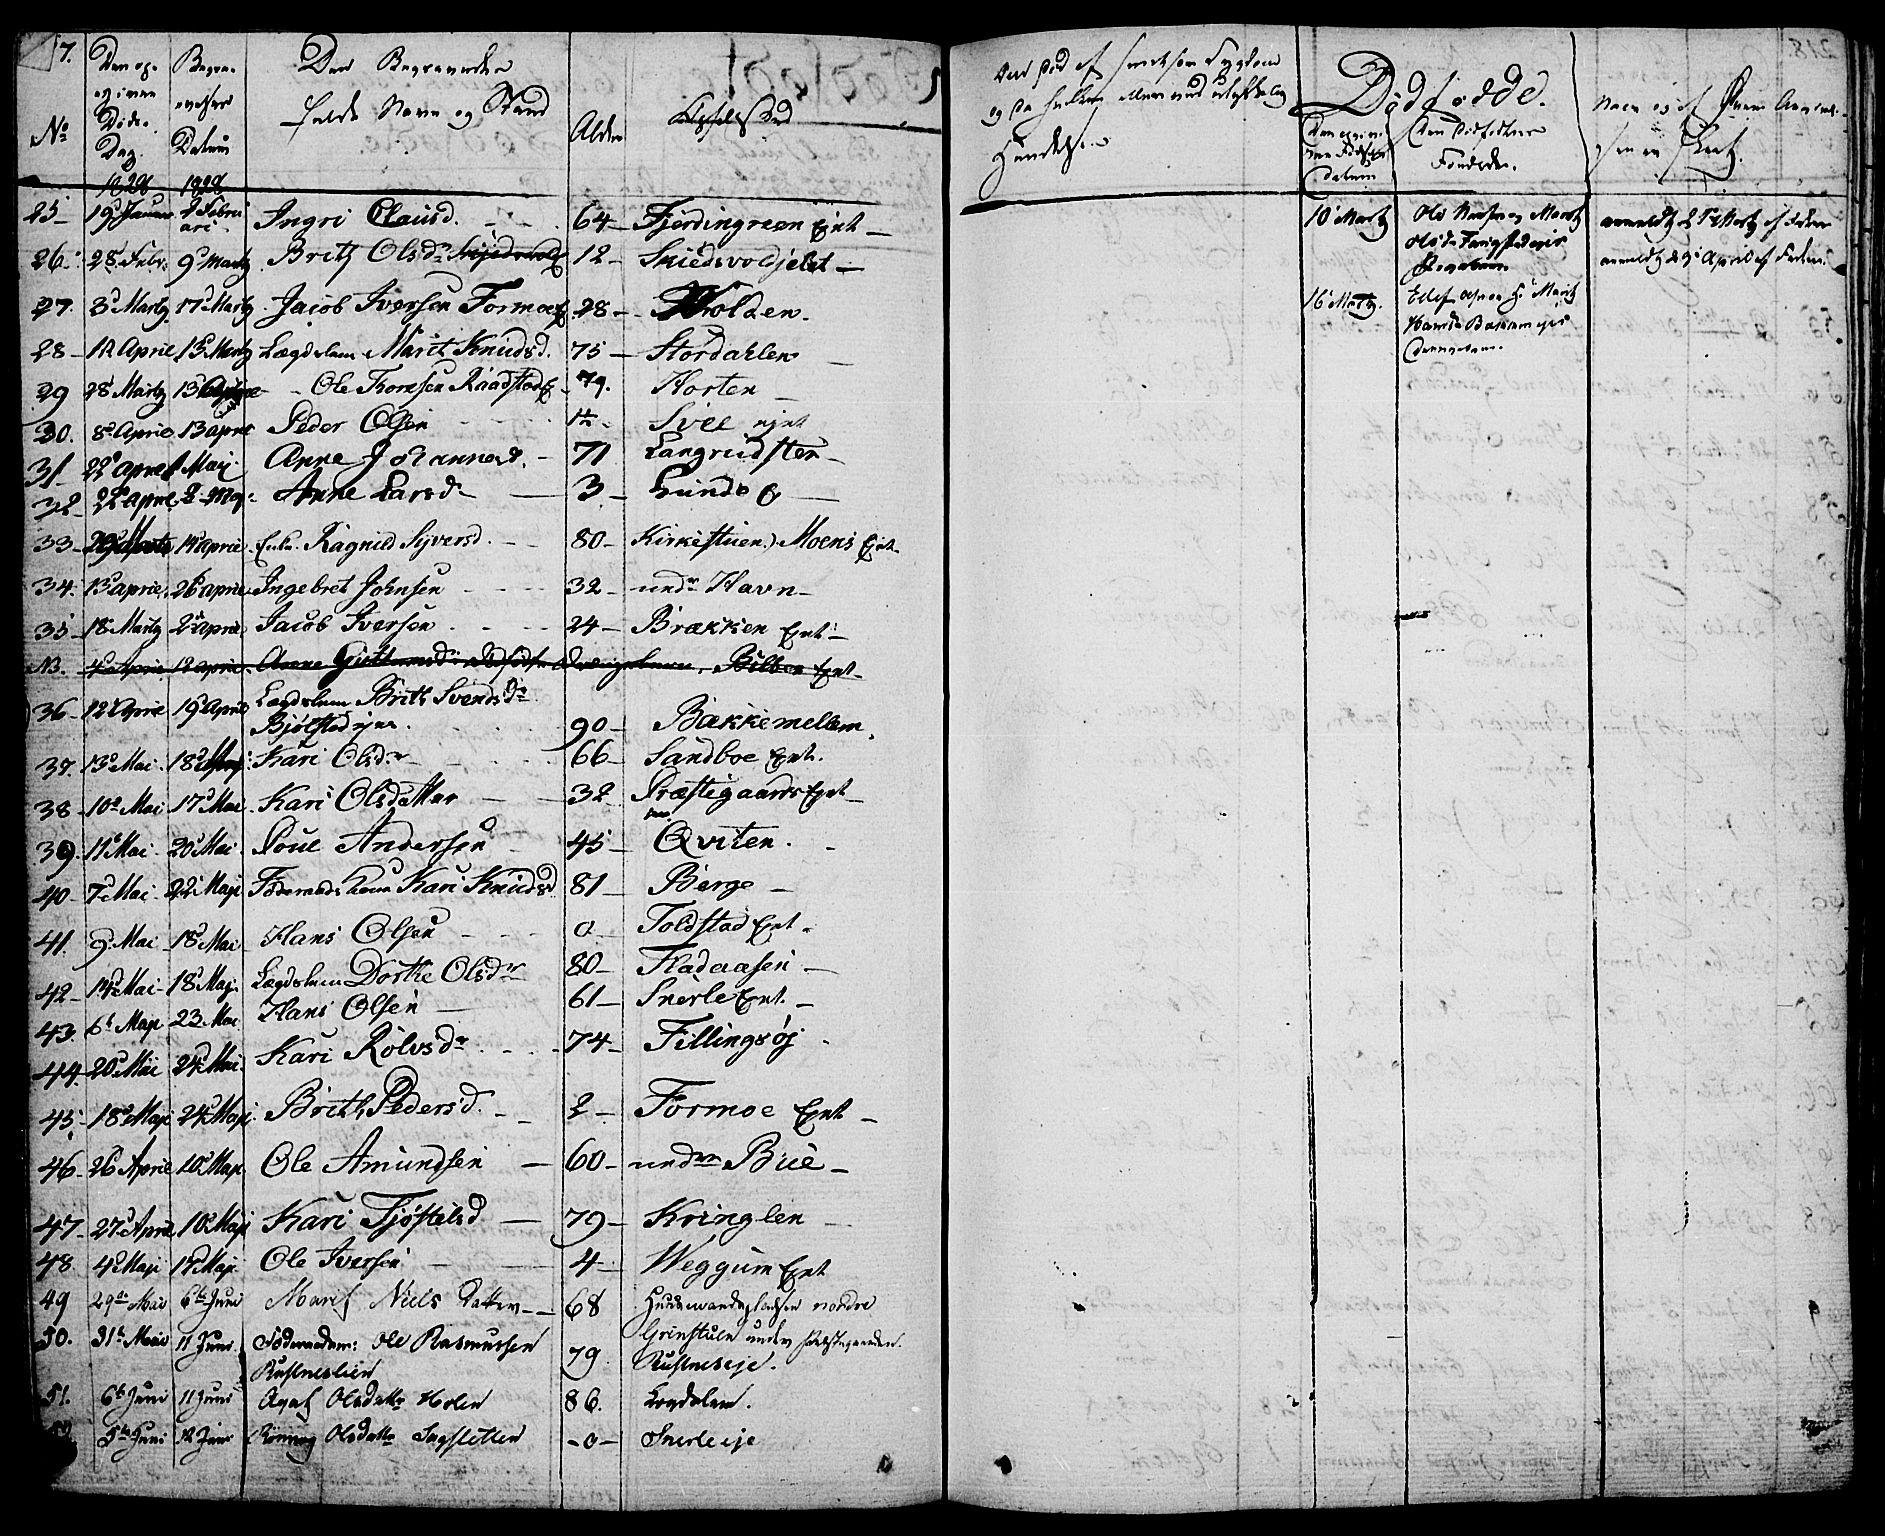 SAH, Vågå prestekontor, Ministerialbok nr. 4 /1, 1827-1842, s. 217